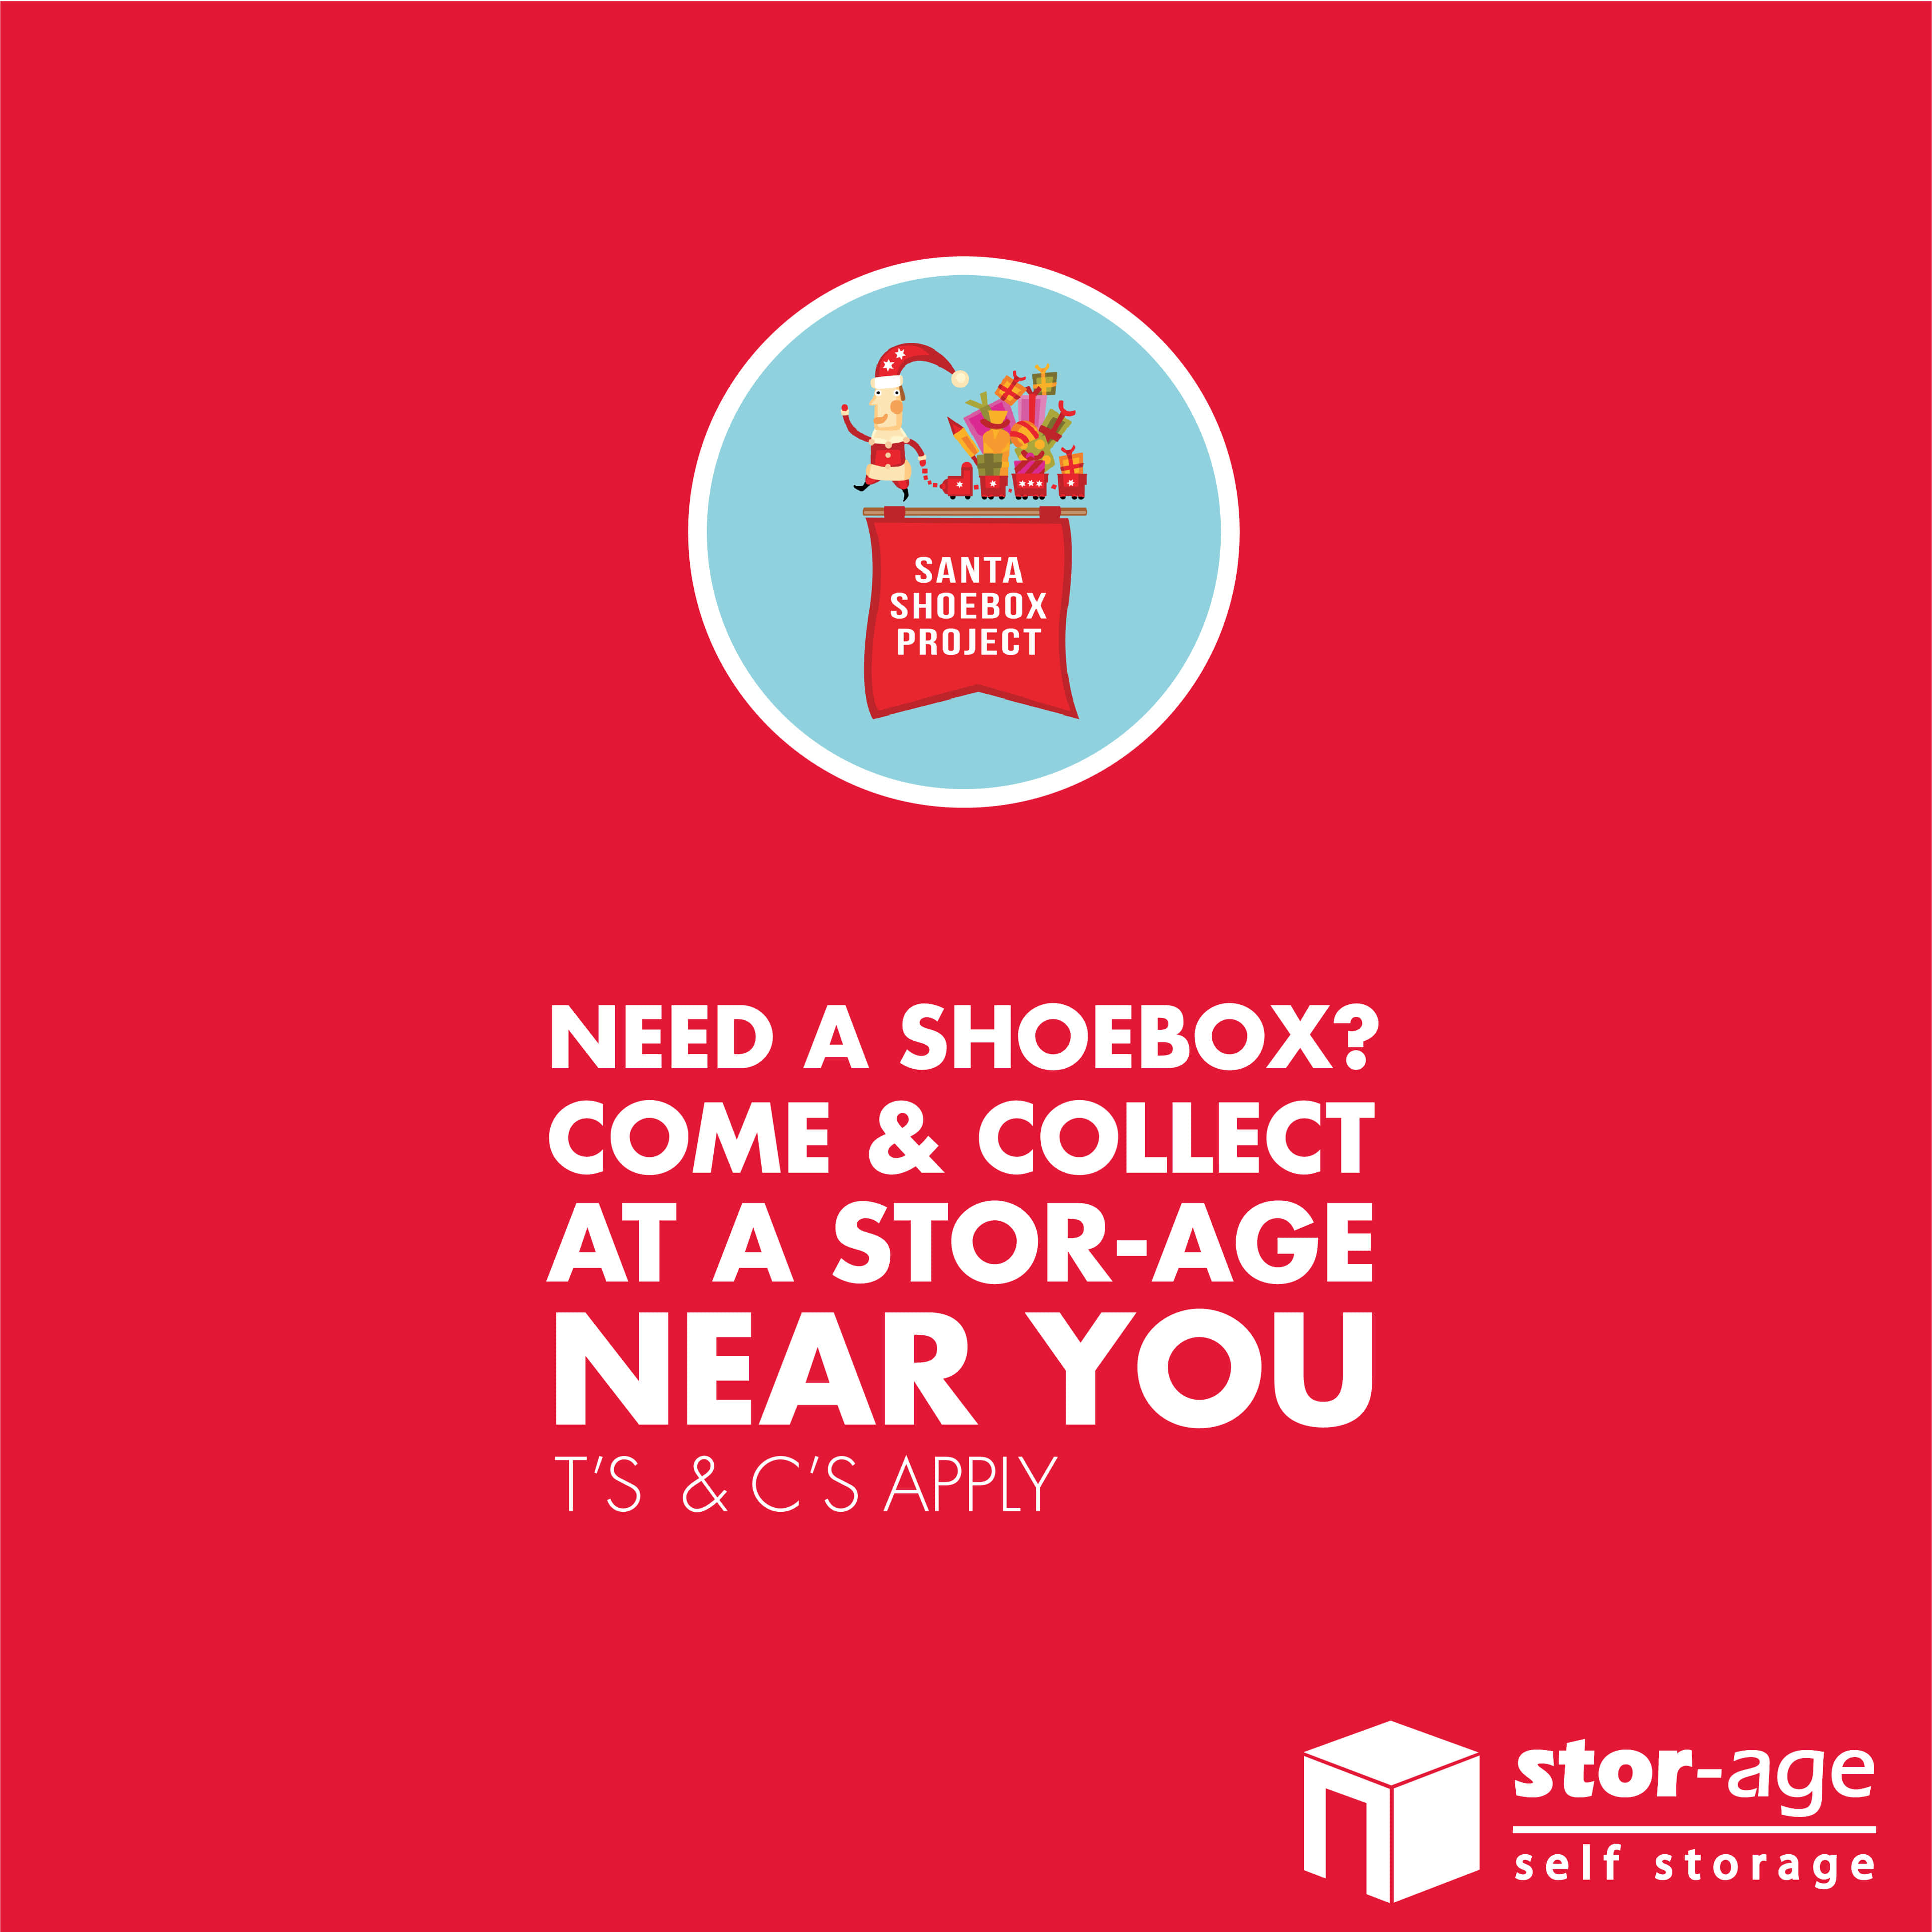 Festive Cheer With Santa Shoebox Partnership